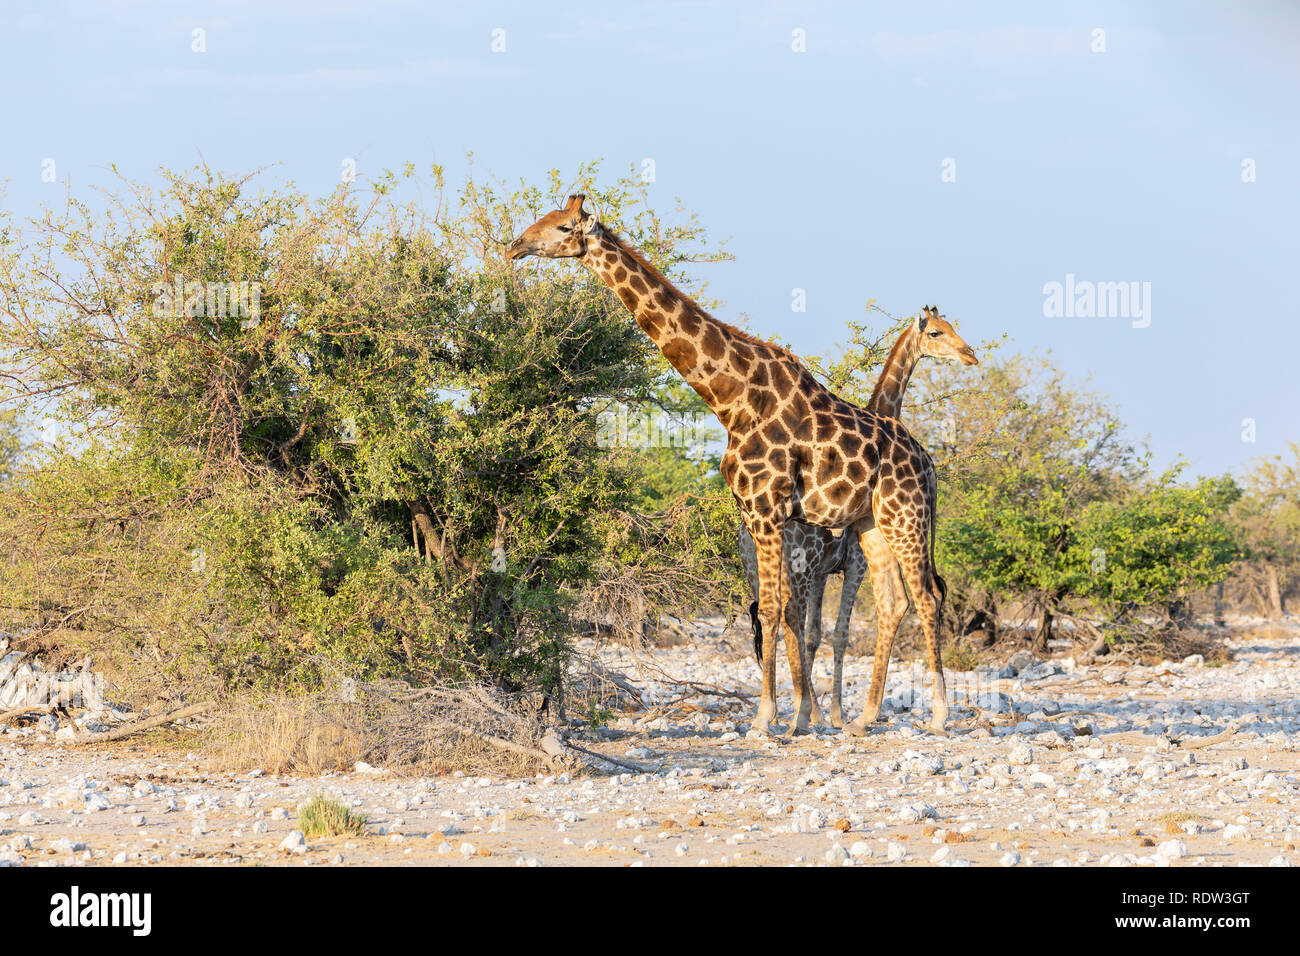 Southern giraffe (Giraffa giraffa). Subspecies - Angolan Giraffe or Namibian Giraffe (Giraffa giraffa angolensis) - Stock Image